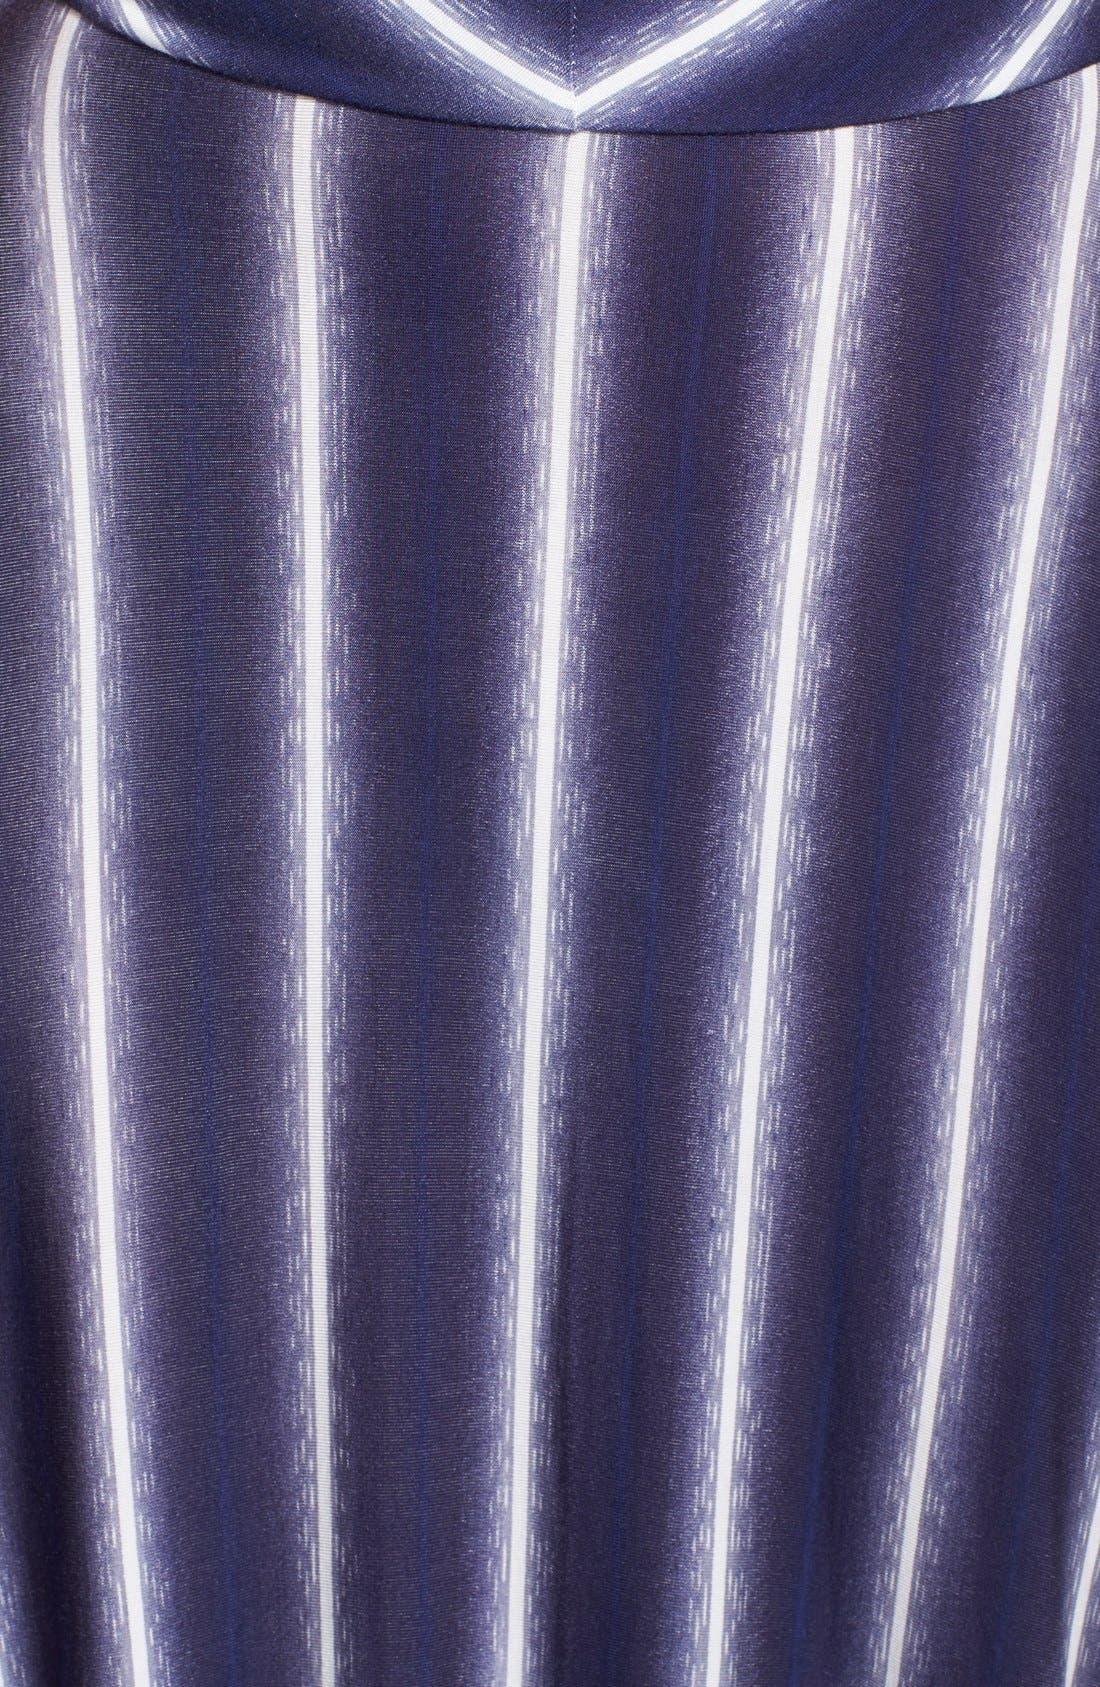 Stripe Scoop Neck Maxi Dress,                             Alternate thumbnail 3, color,                             429